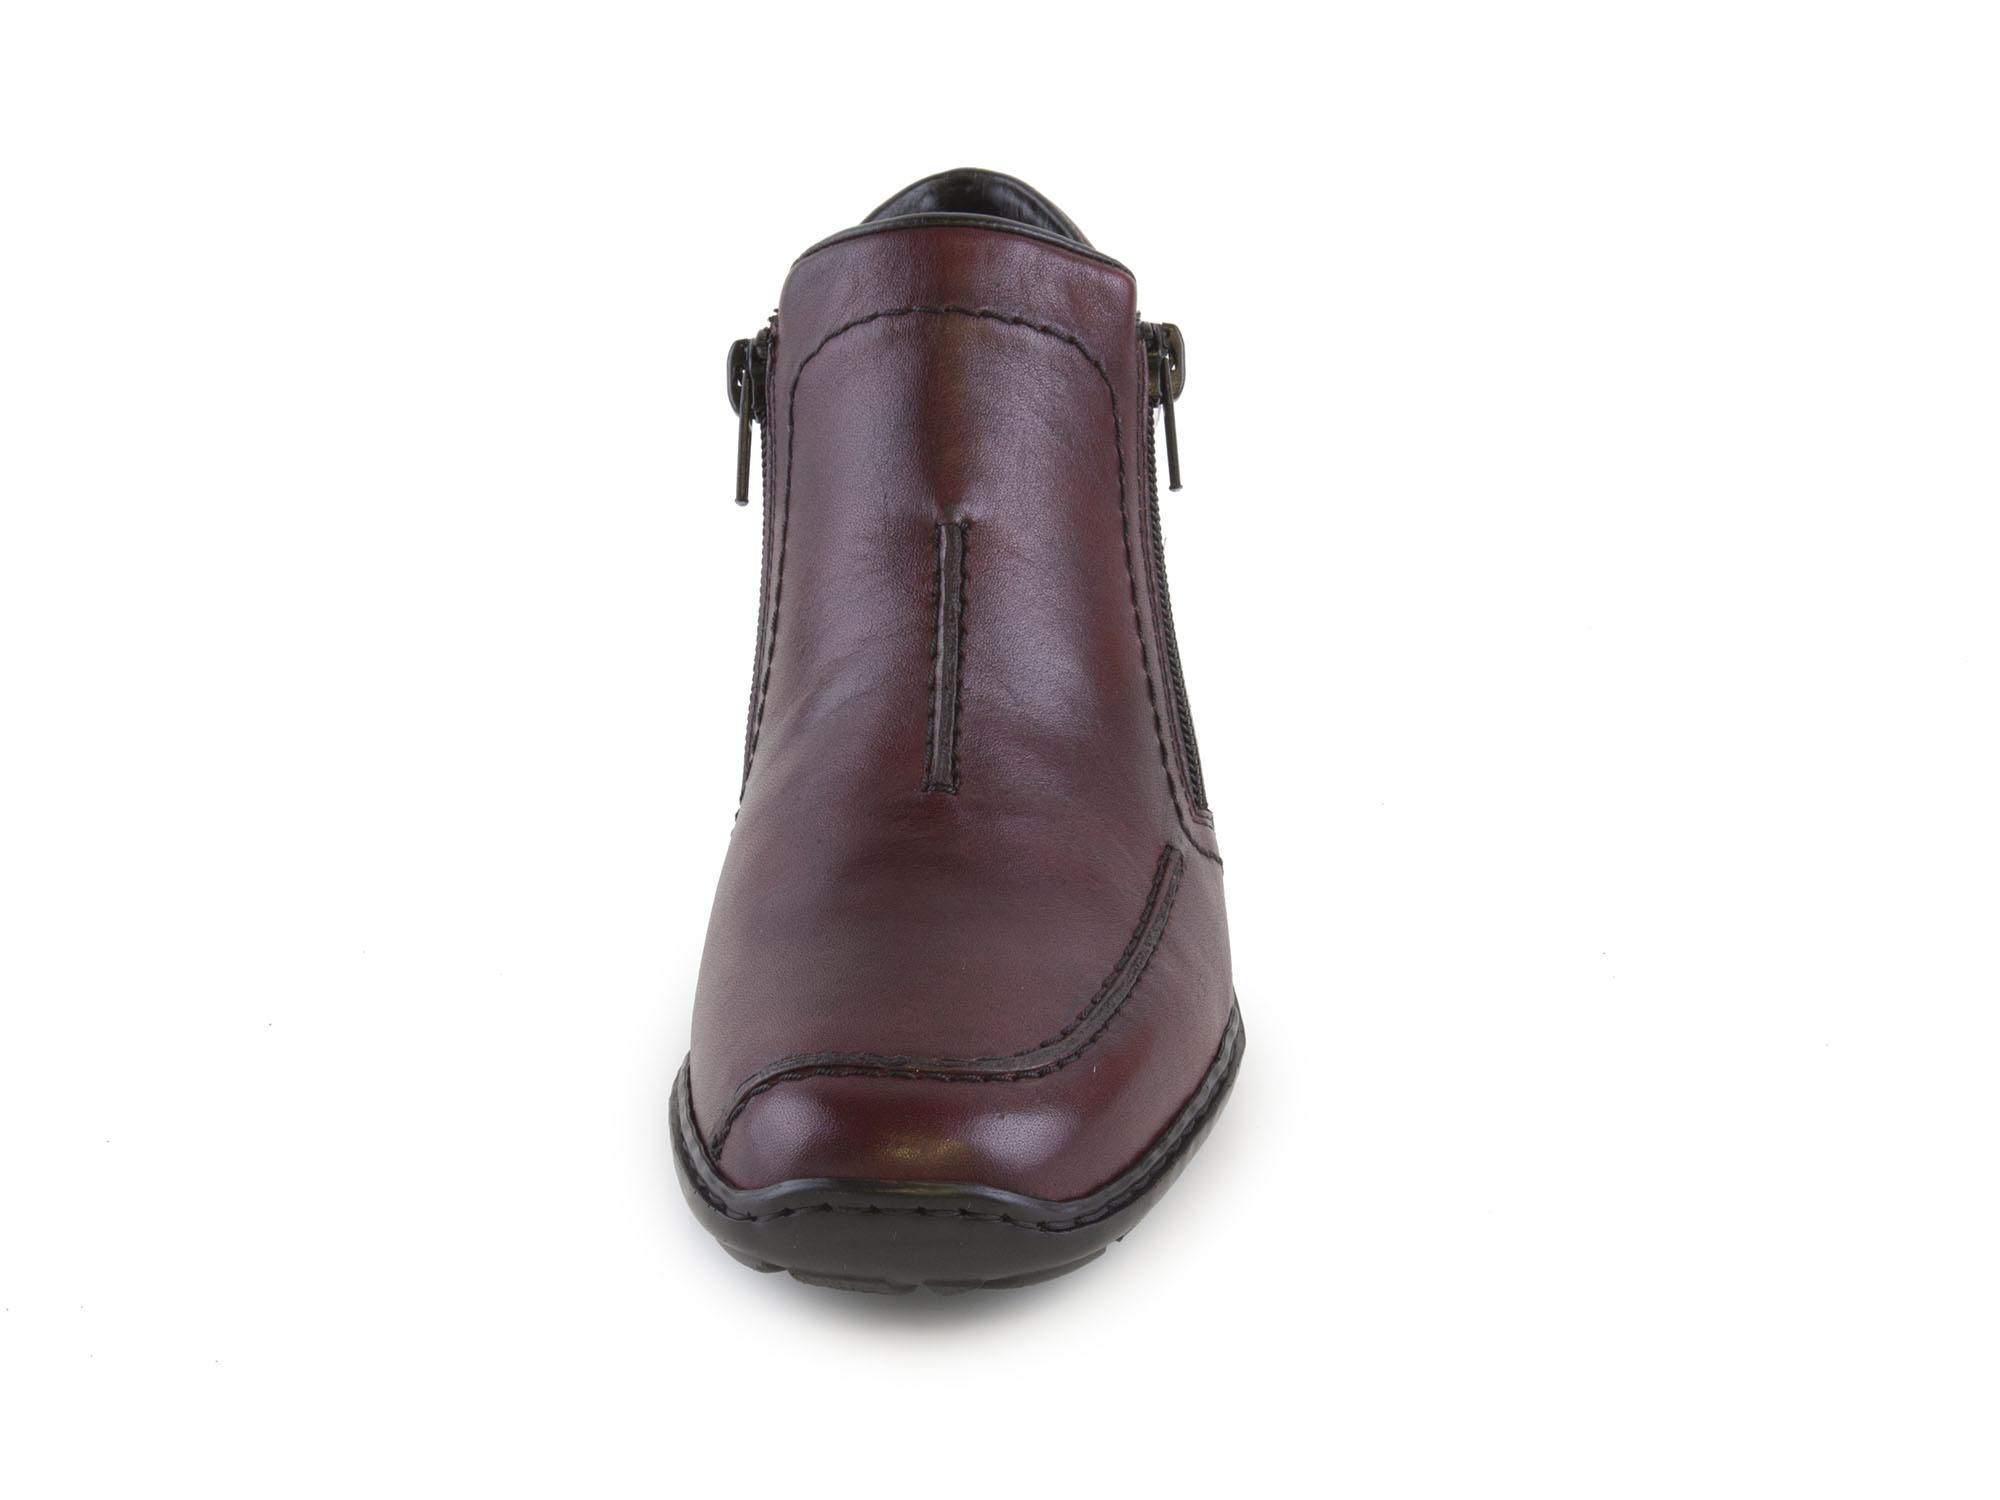 0be5dc1685ef detail Dámská obuv RIEKER 58386 35 ROT H W 7